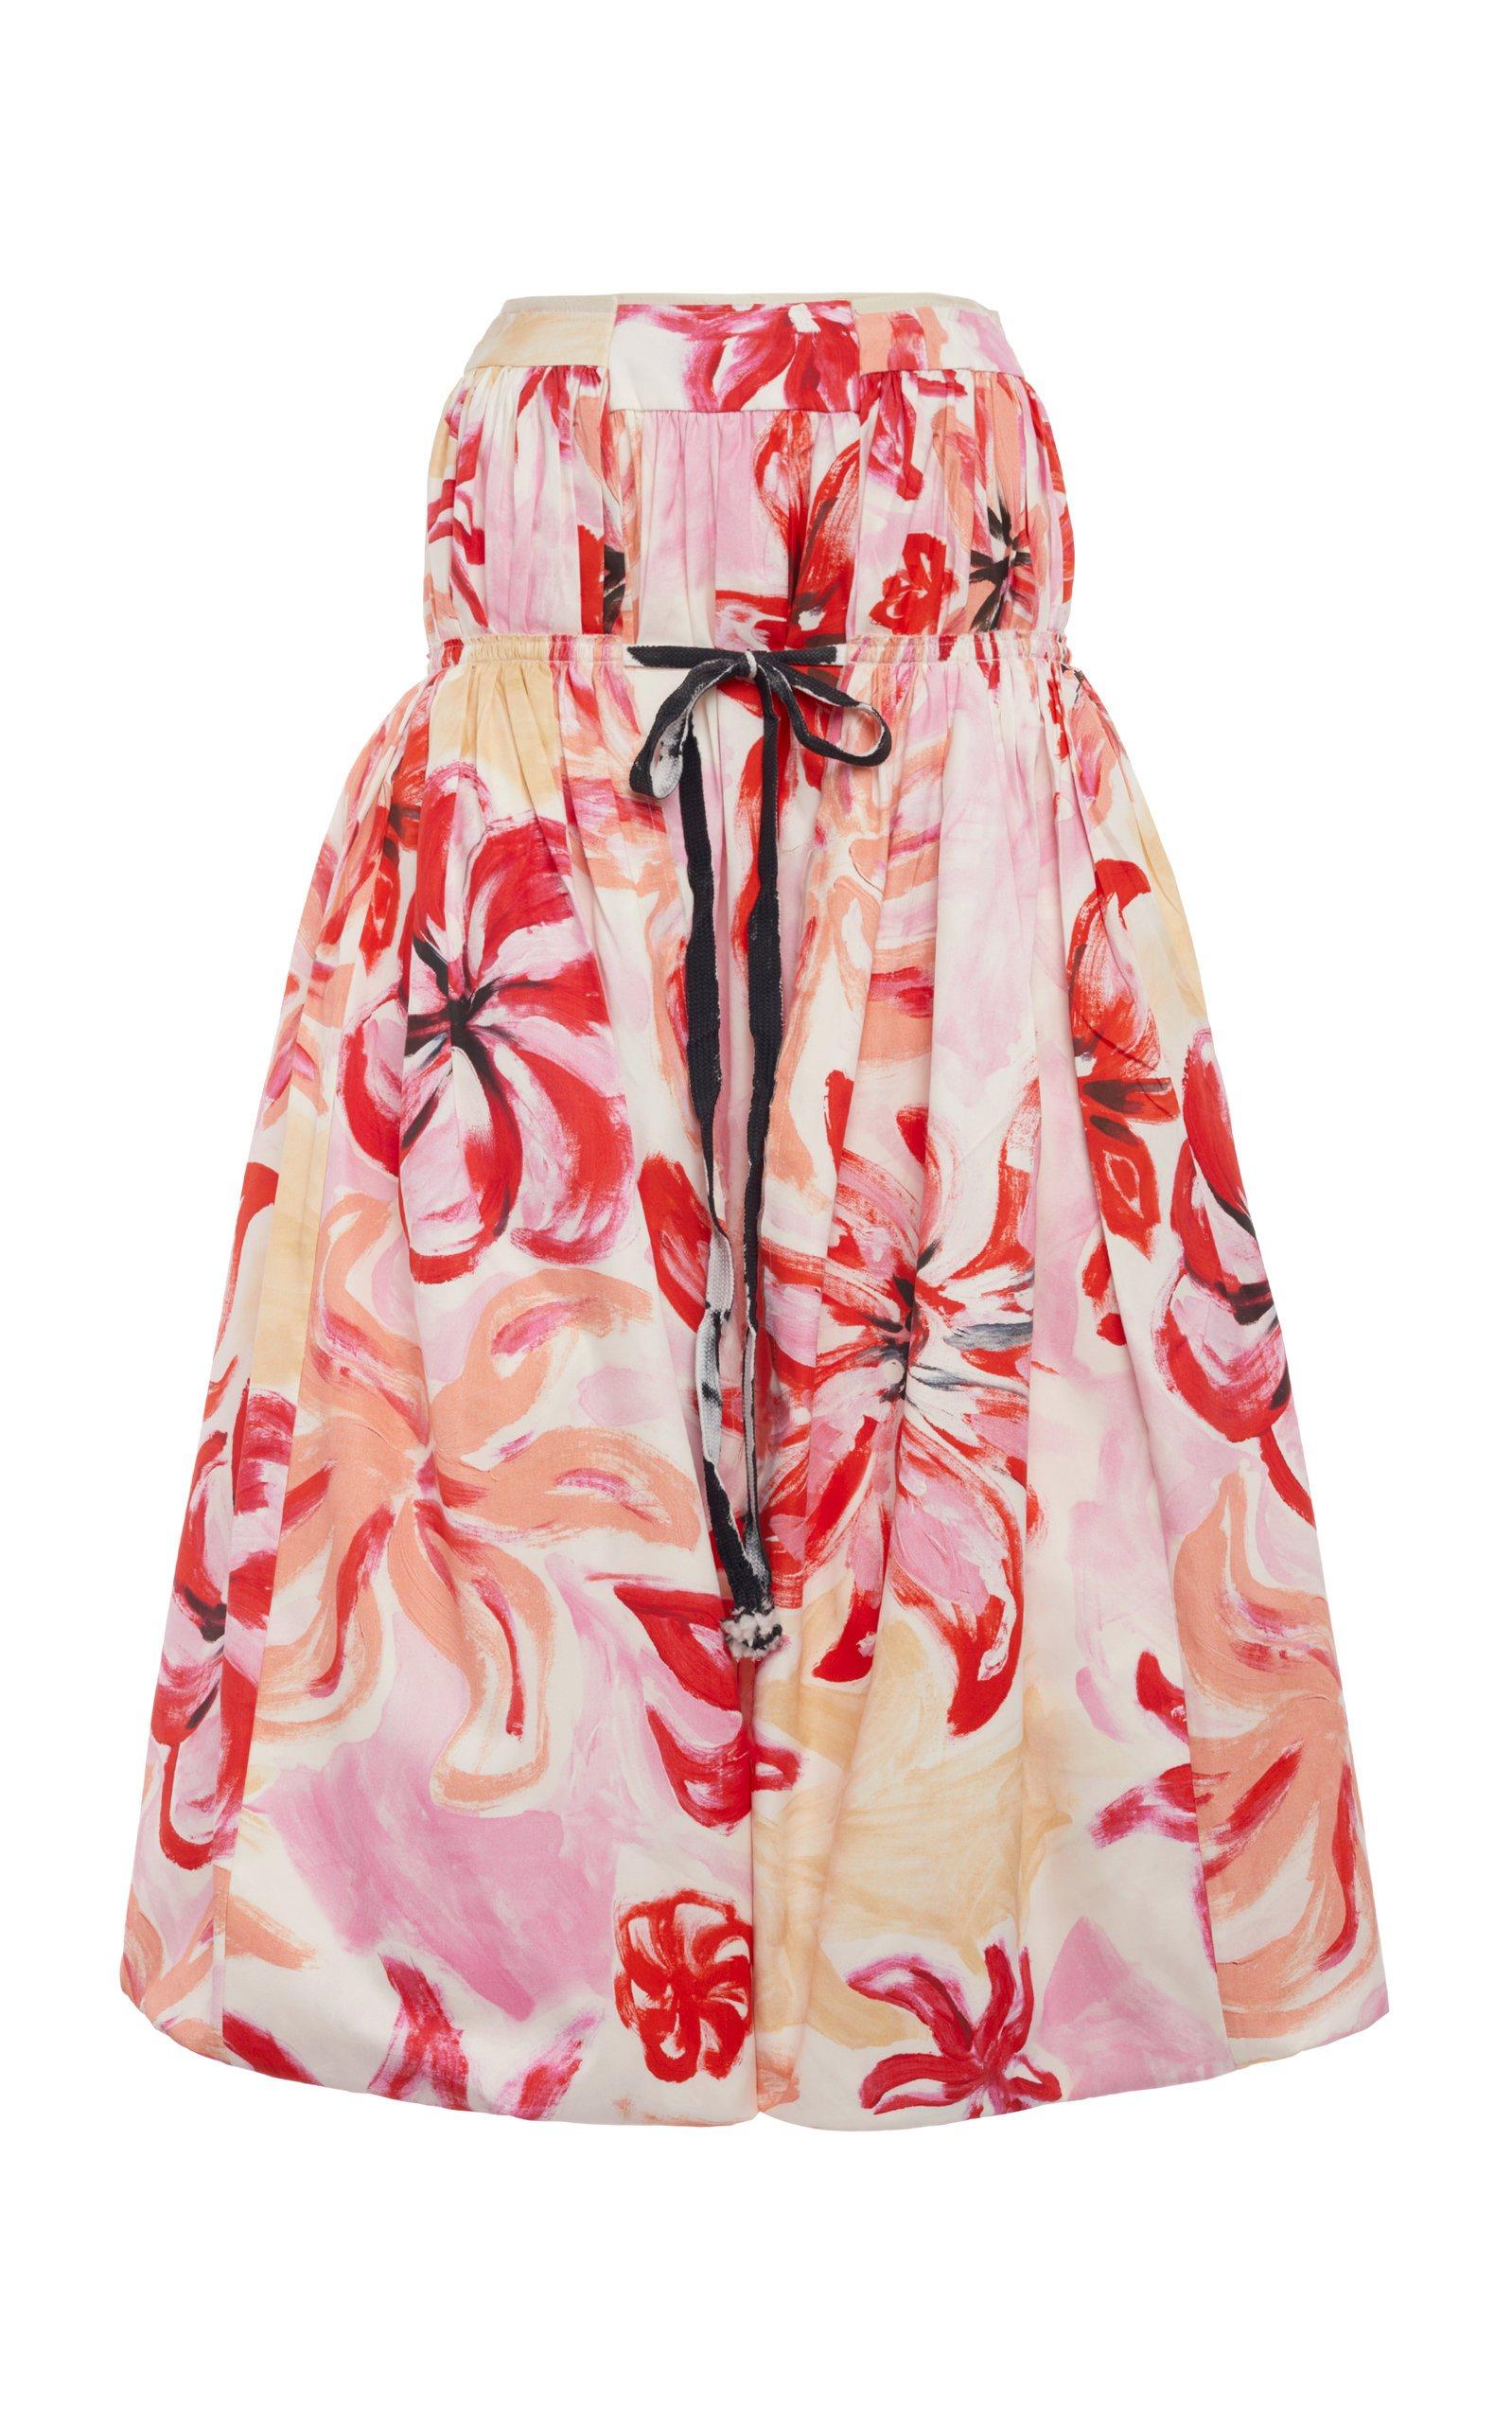 Marni Floral-Print Cotton-Silk Midi Skirt Size: 44